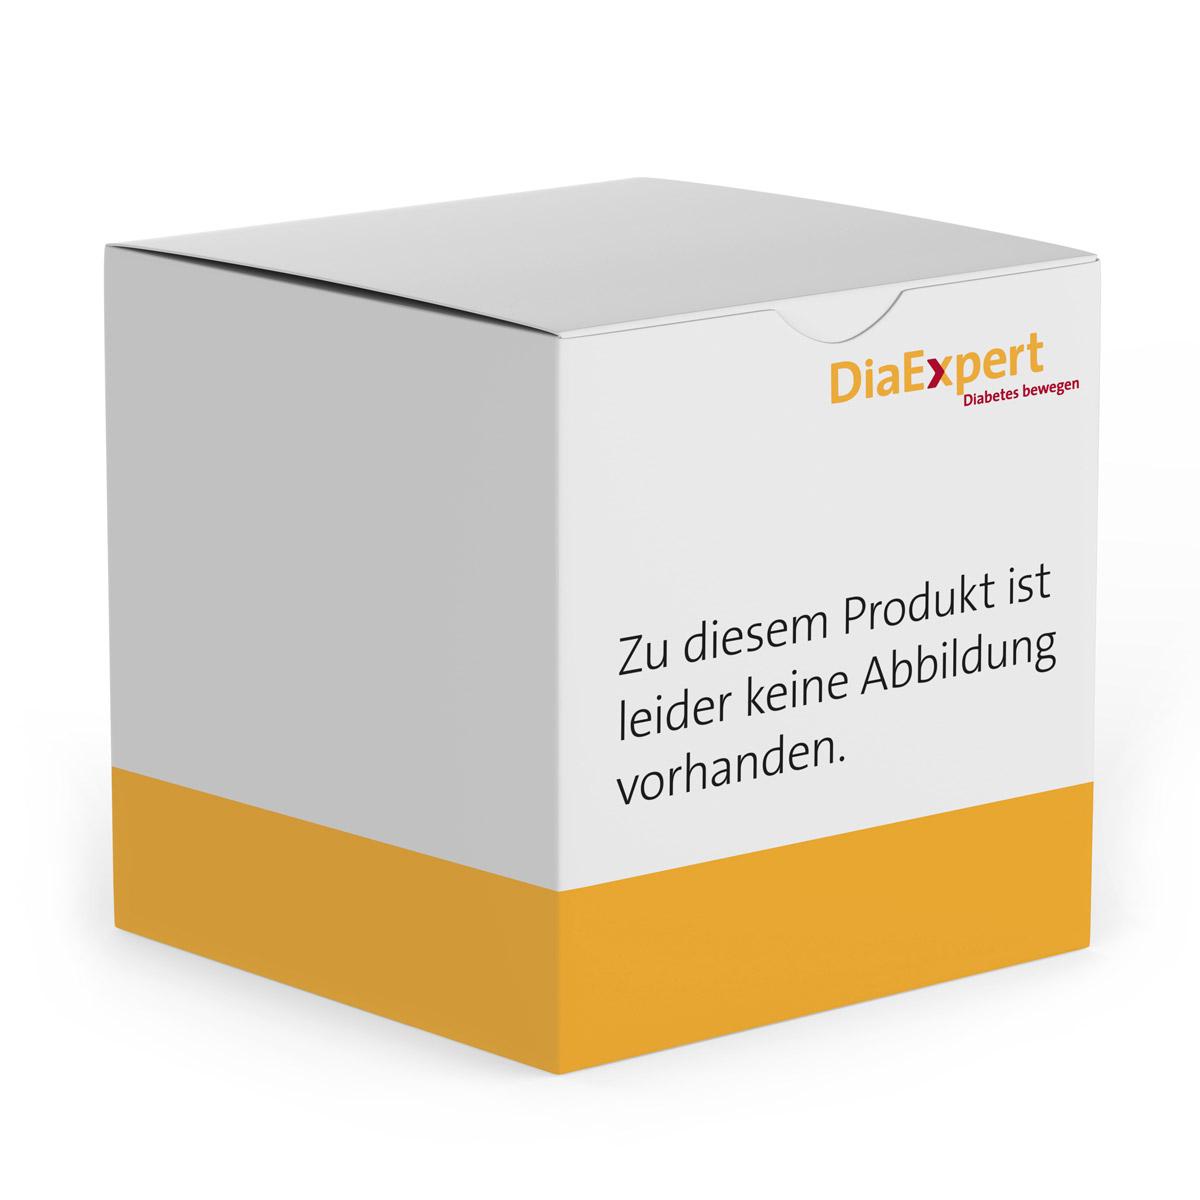 Traubenzucker-Würfel Waldfrucht DiaExpert 1 Beutel à 50 Stück